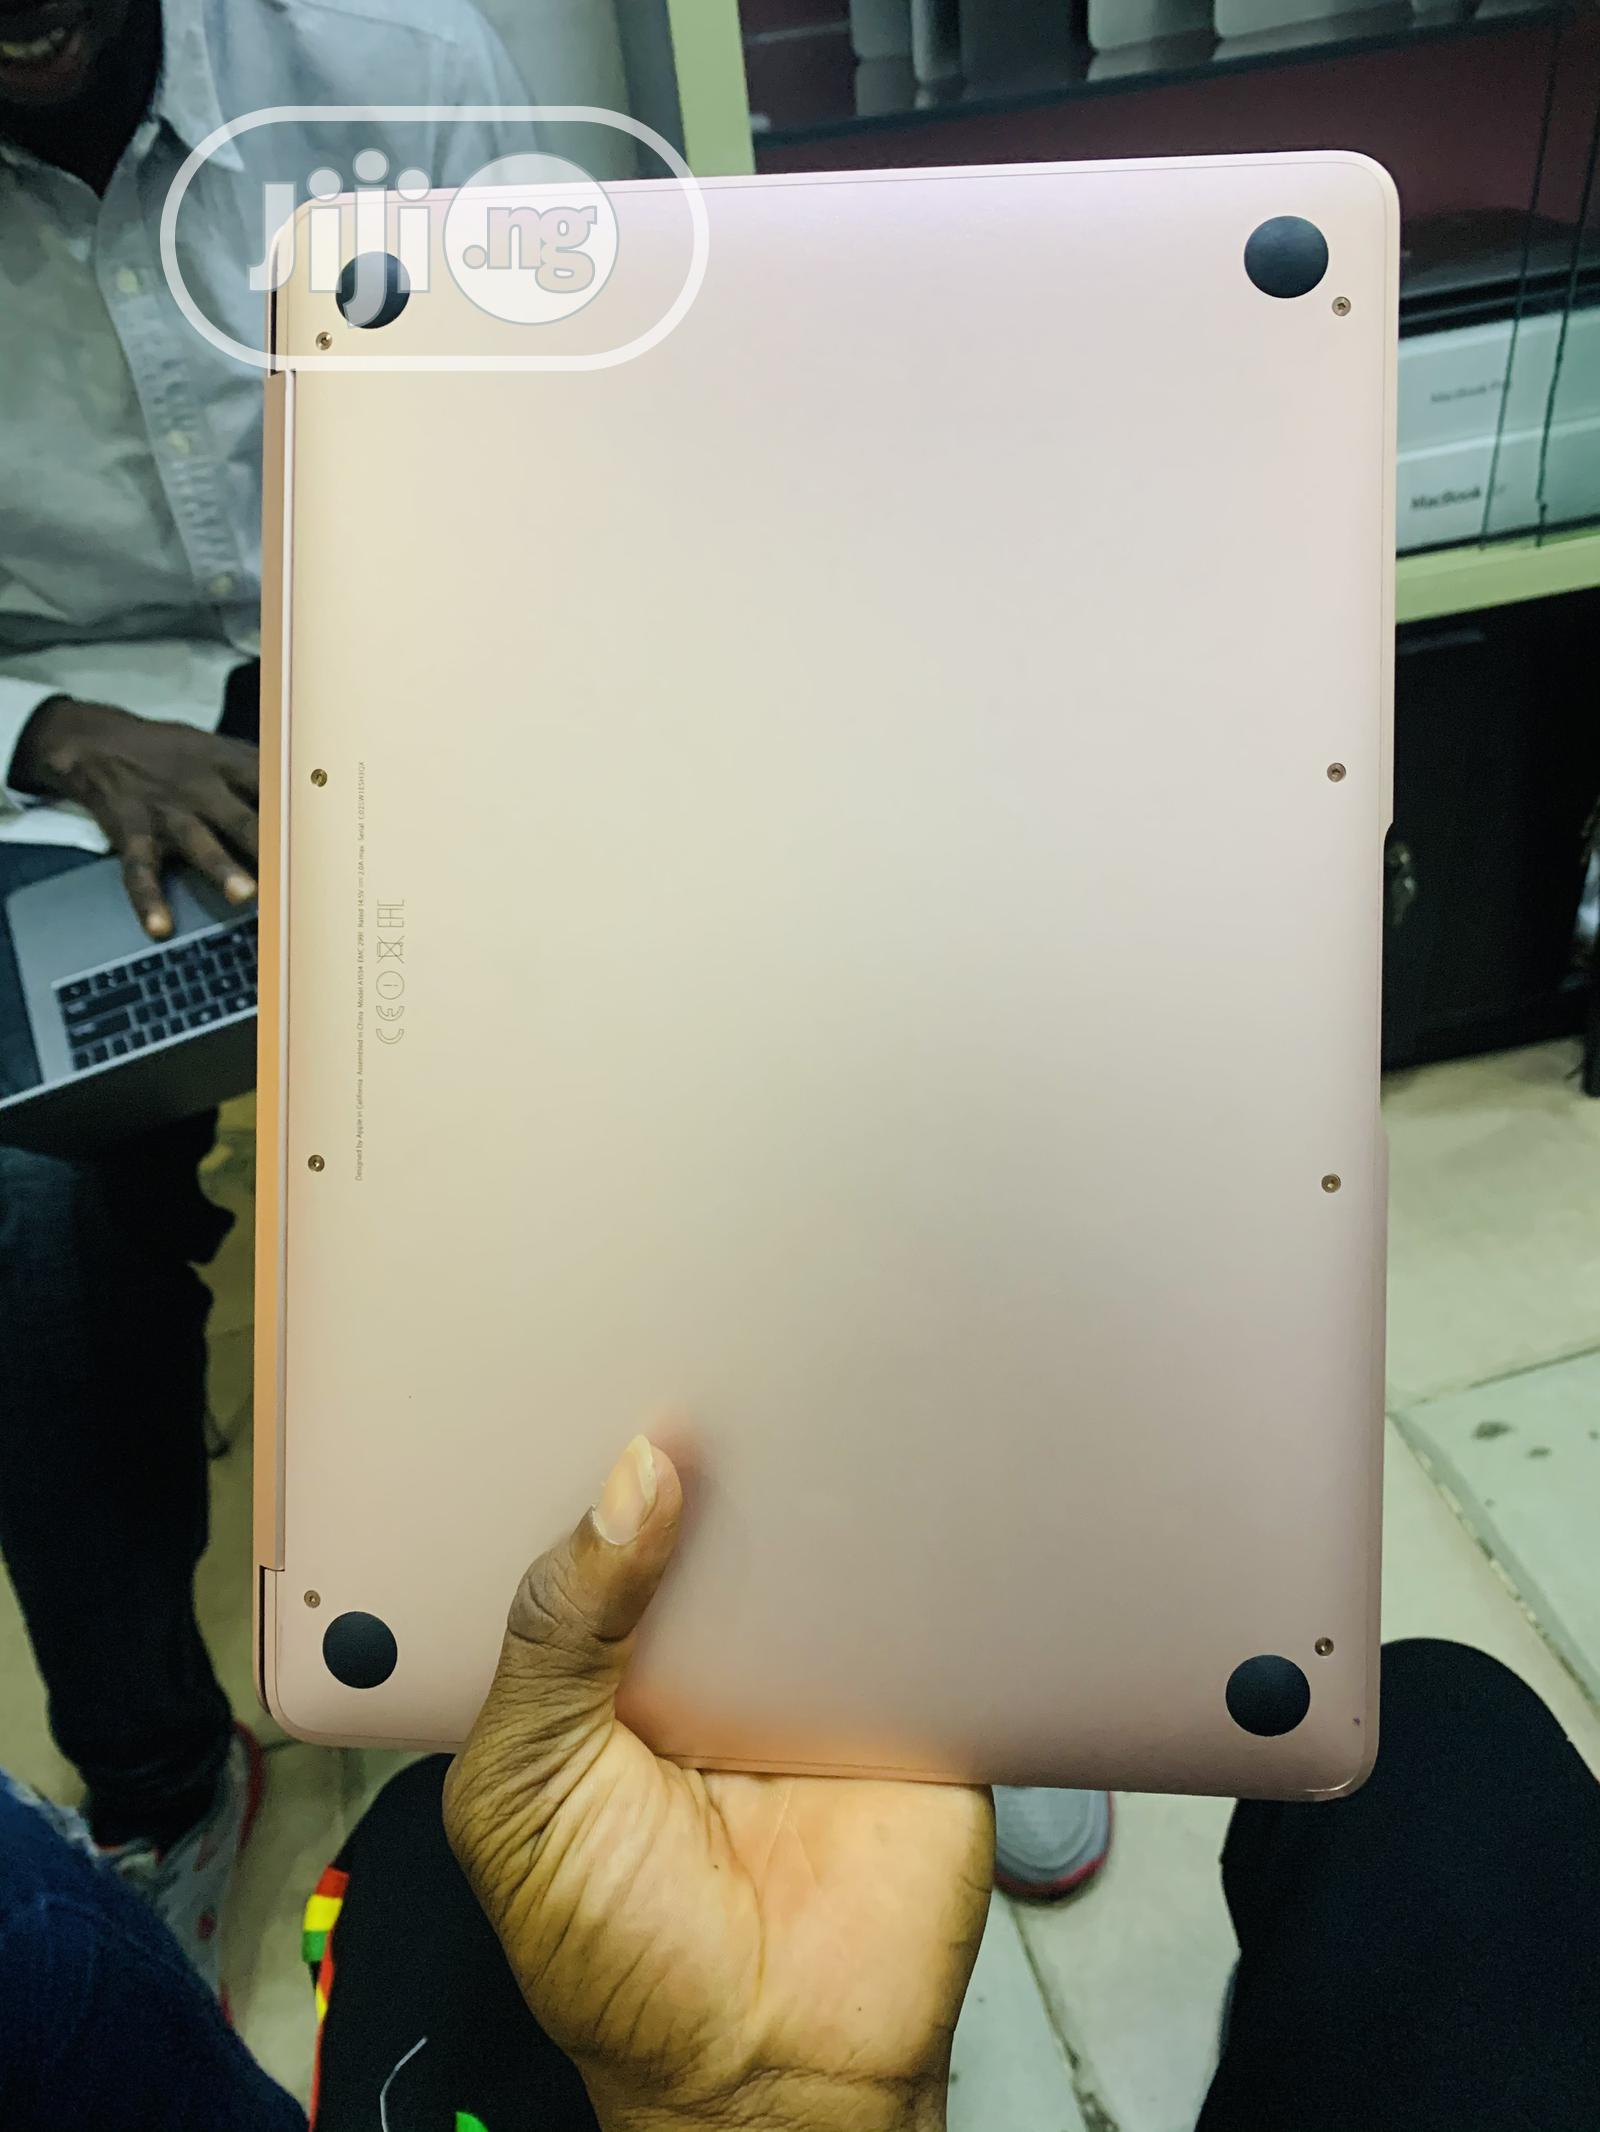 Laptop Apple MacBook 2016 8GB Intel Core I5 SSD 256GB | Laptops & Computers for sale in Ikeja, Lagos State, Nigeria